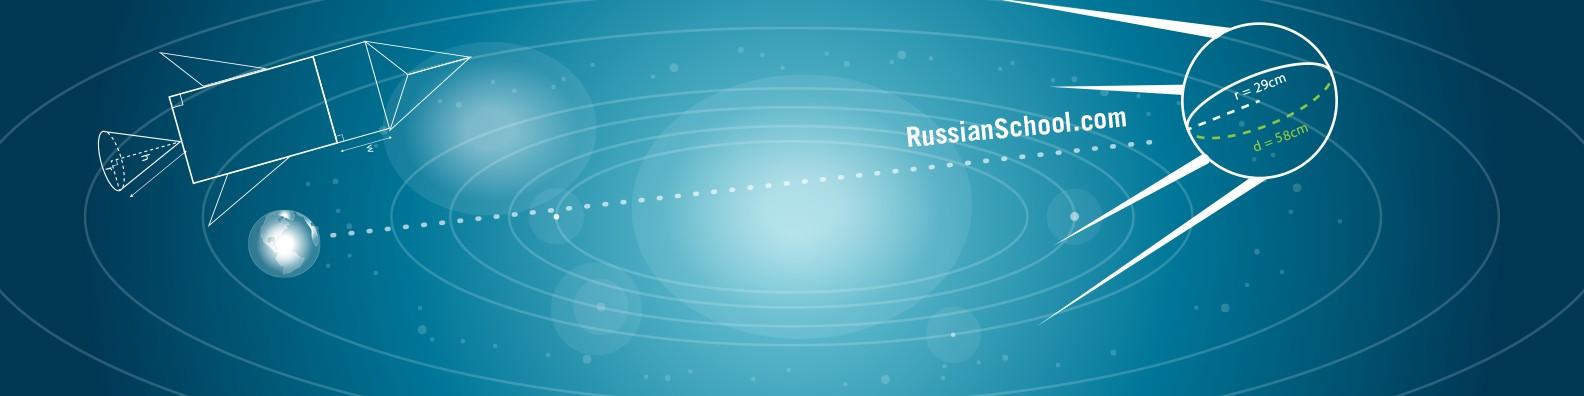 Russian School of Mathematics | LinkedIn